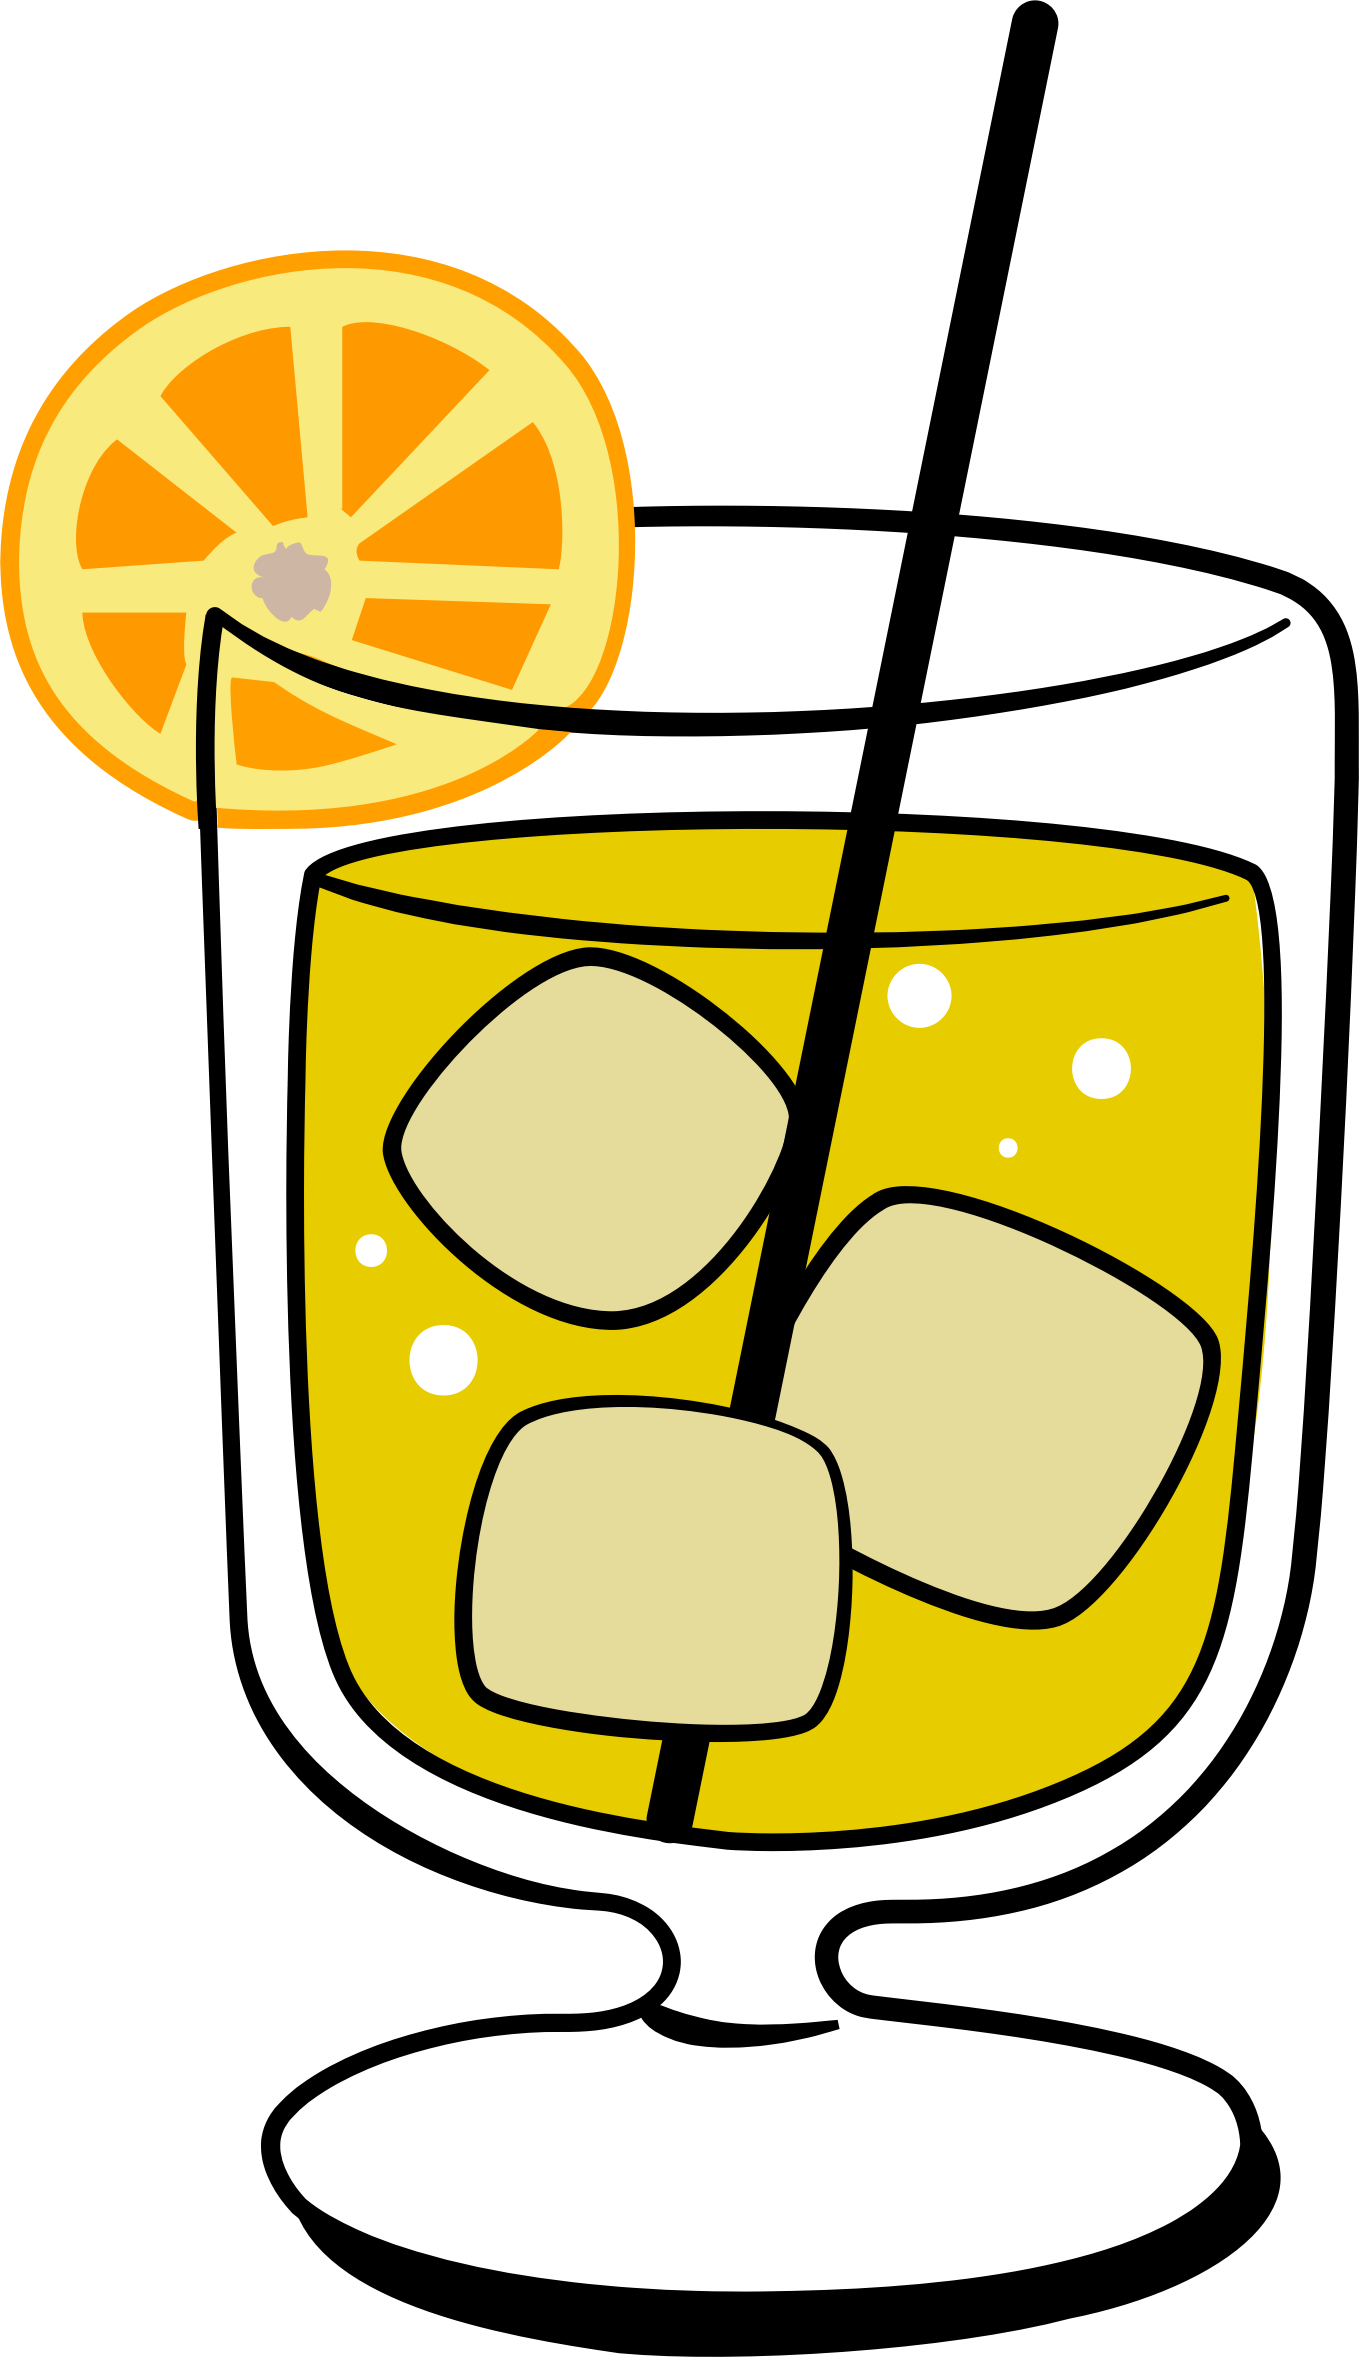 . Screwdriver clipart orange